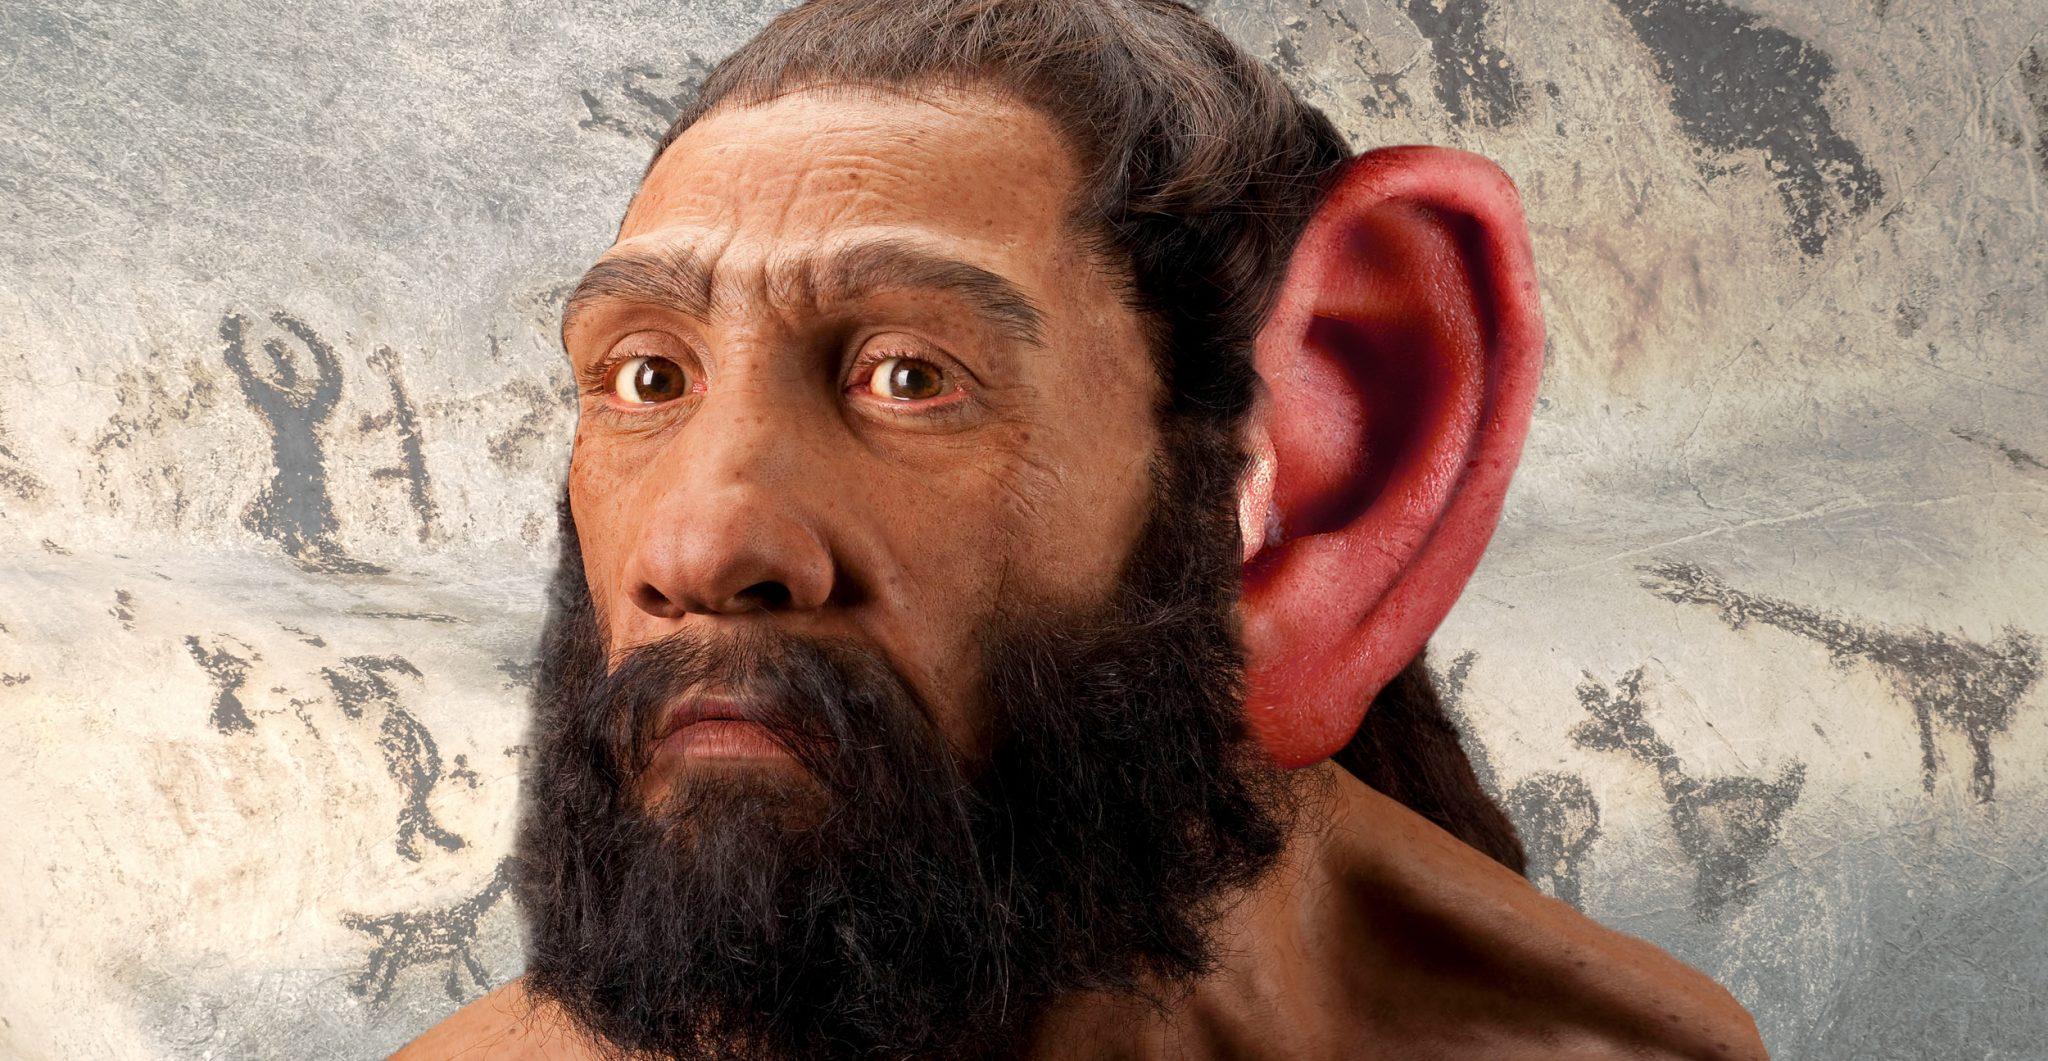 Neanderthal image by Mahuli96 CC by SA-4.0